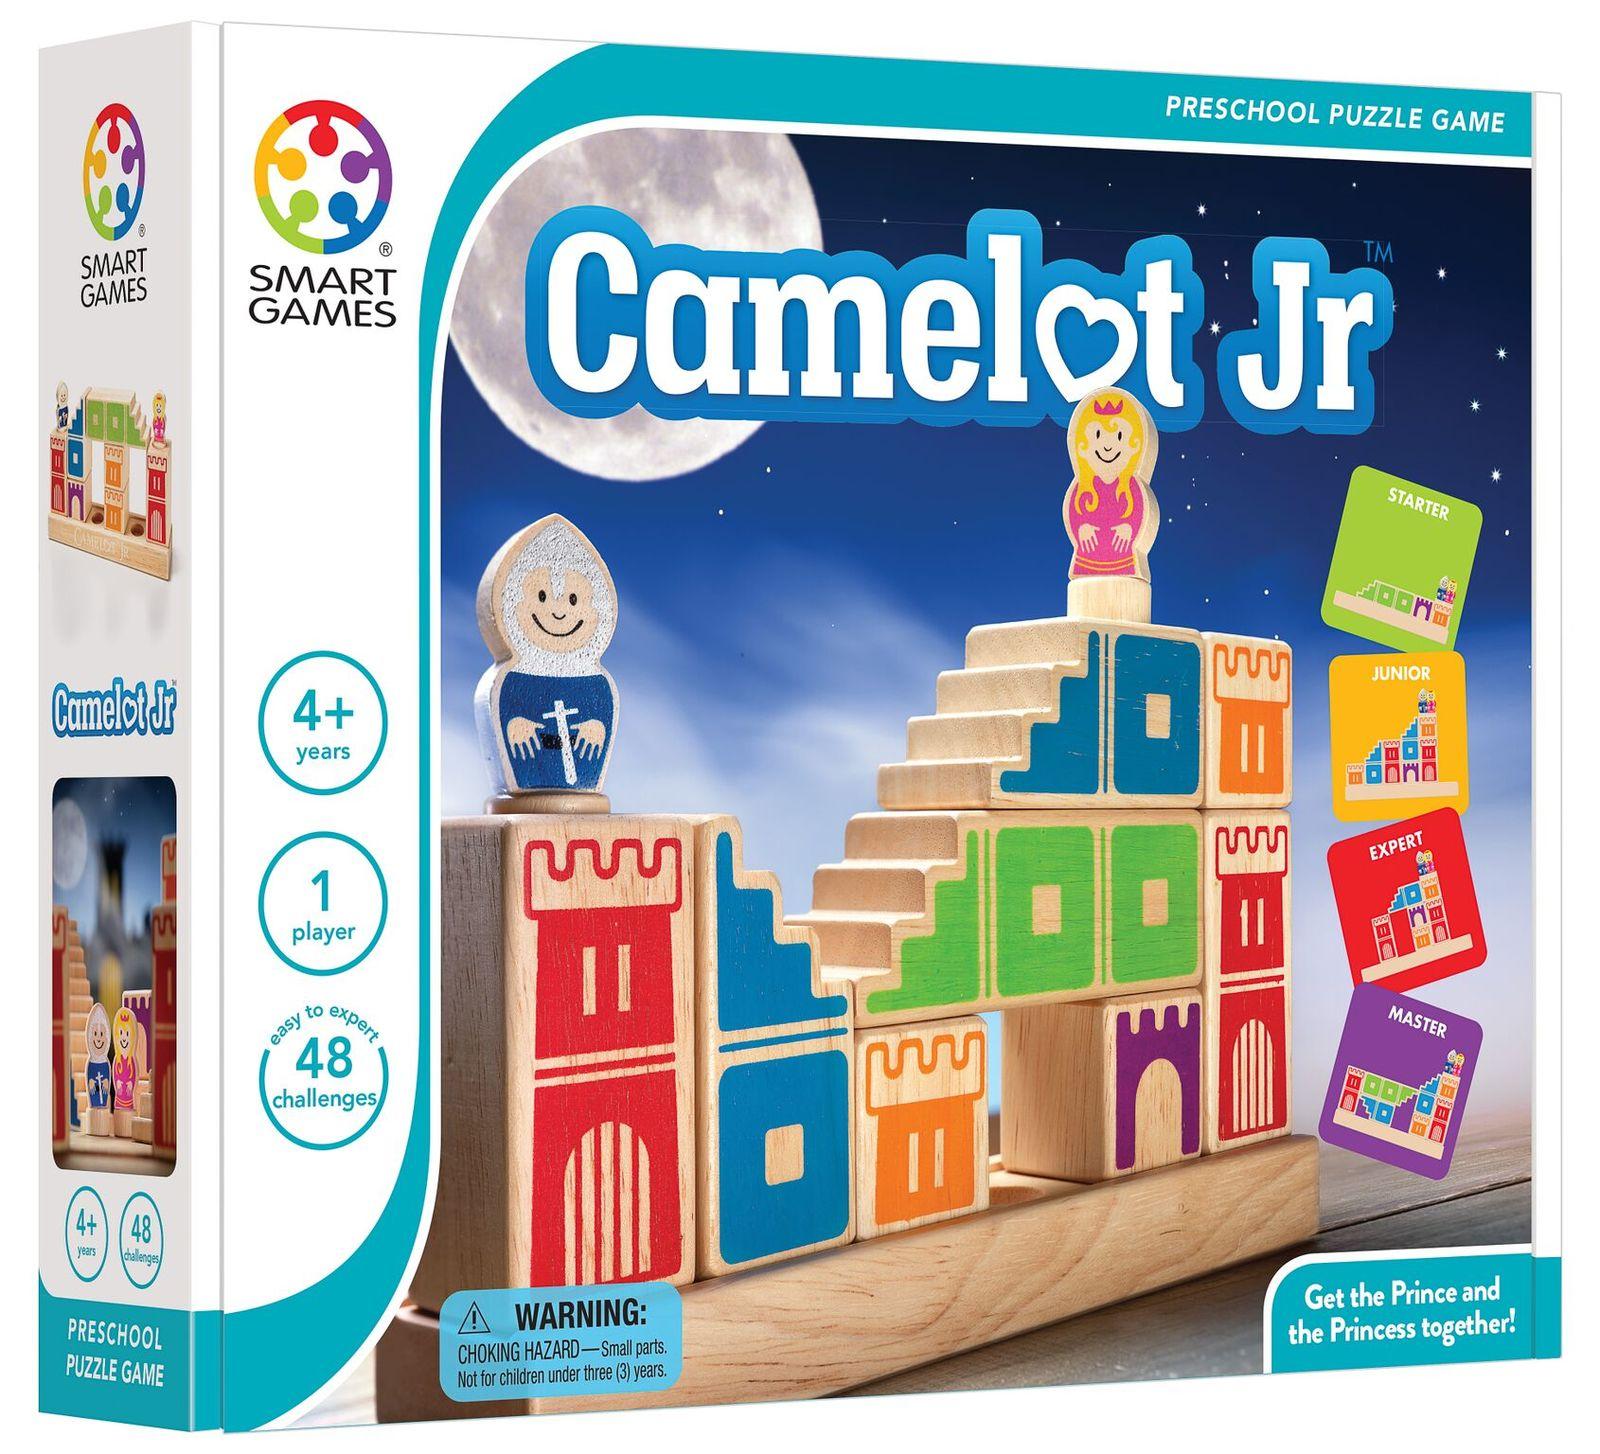 Camelot JR image